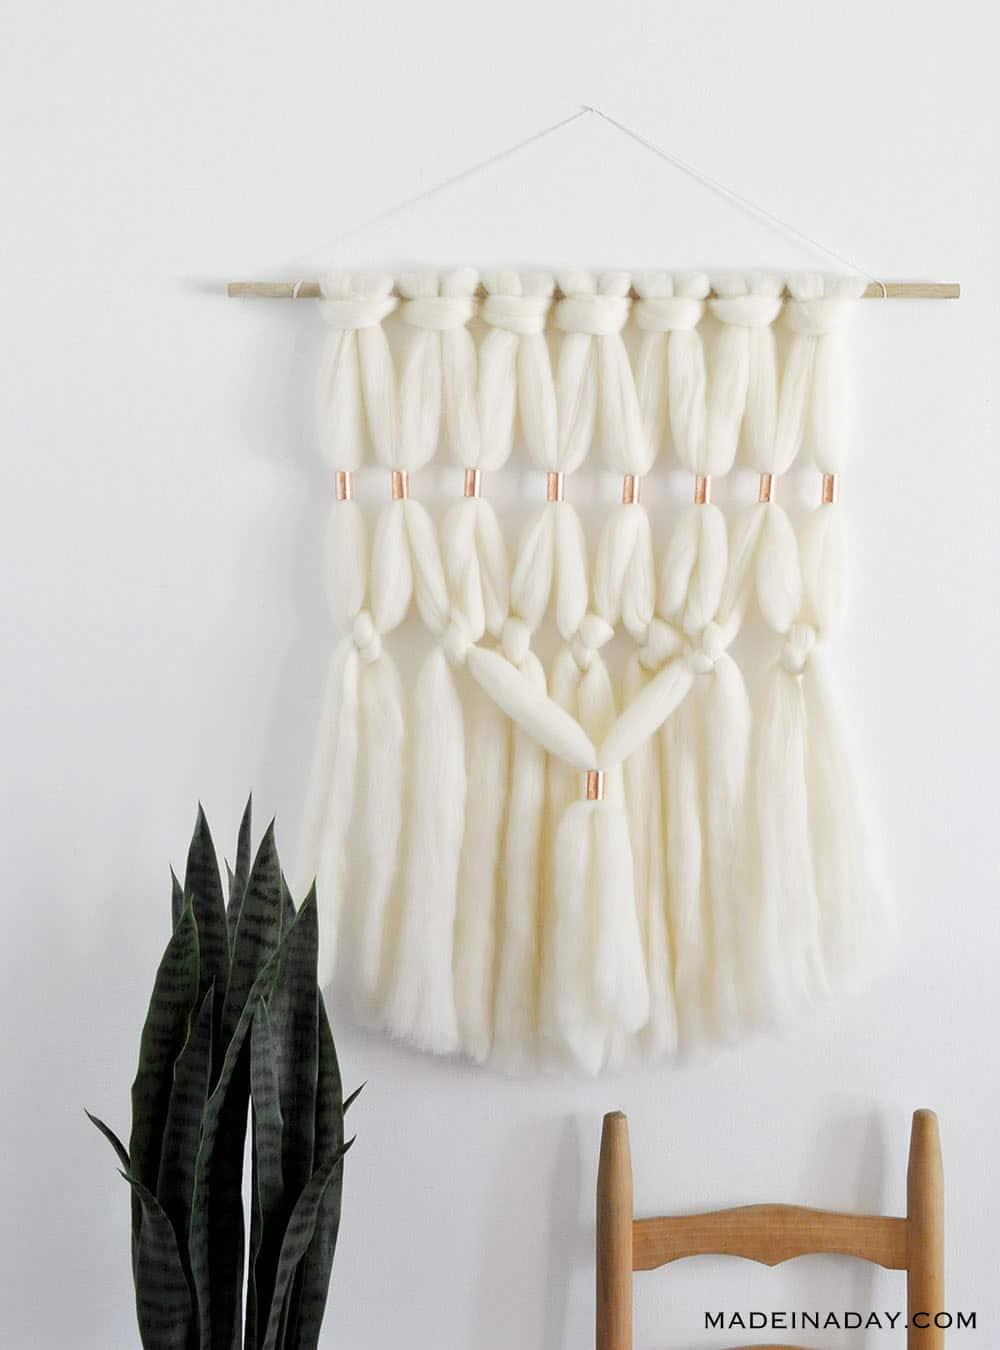 merino wool roving macrame wall hanging wall art, Chunky Wool Wall hanging